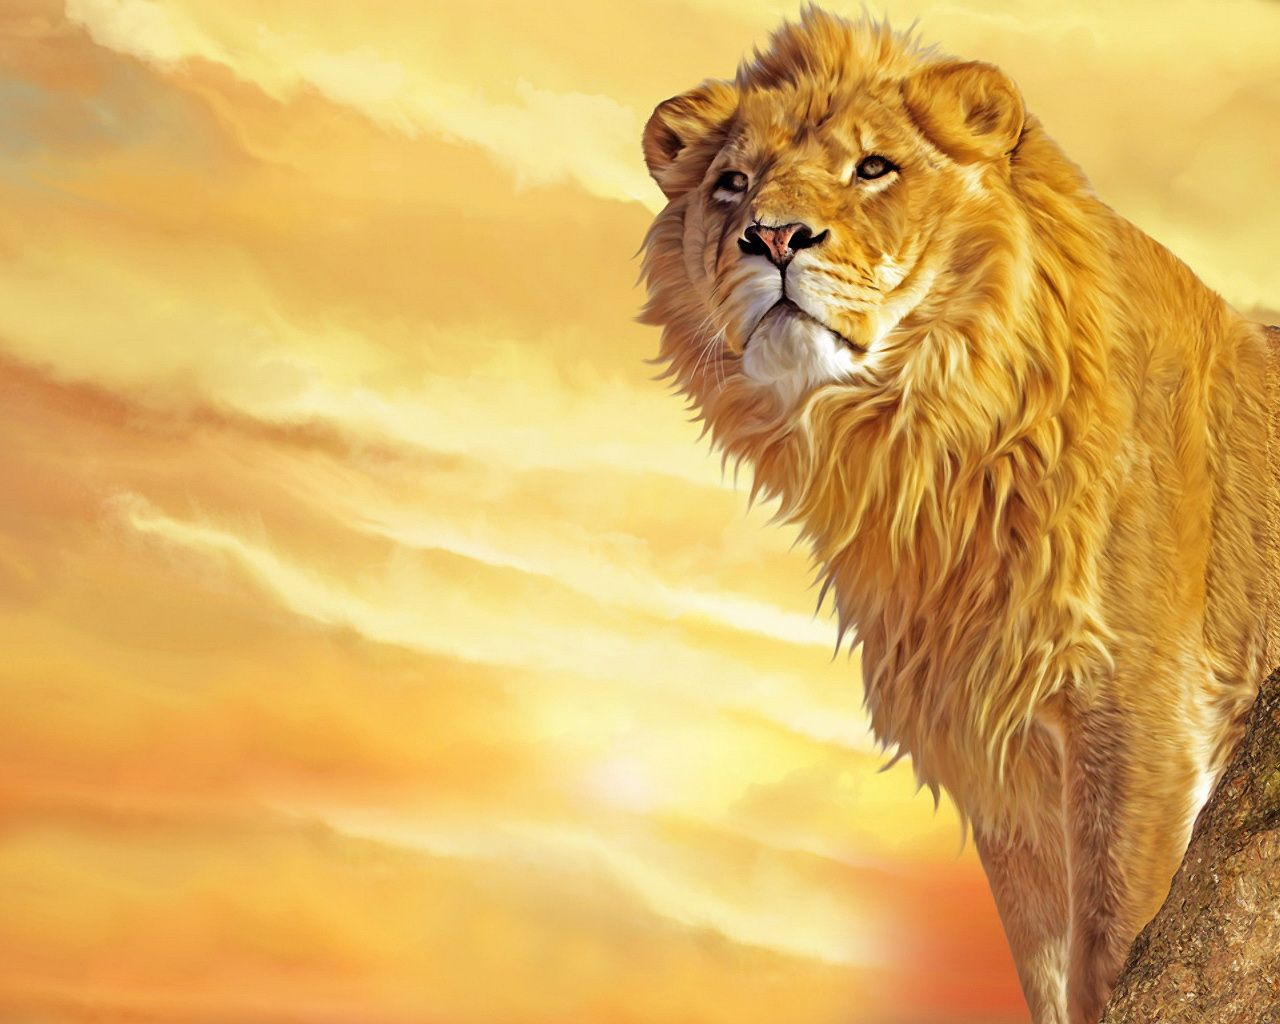 Wallpaper download lion - Download Lion Art Wallpaper Free Wallpapers